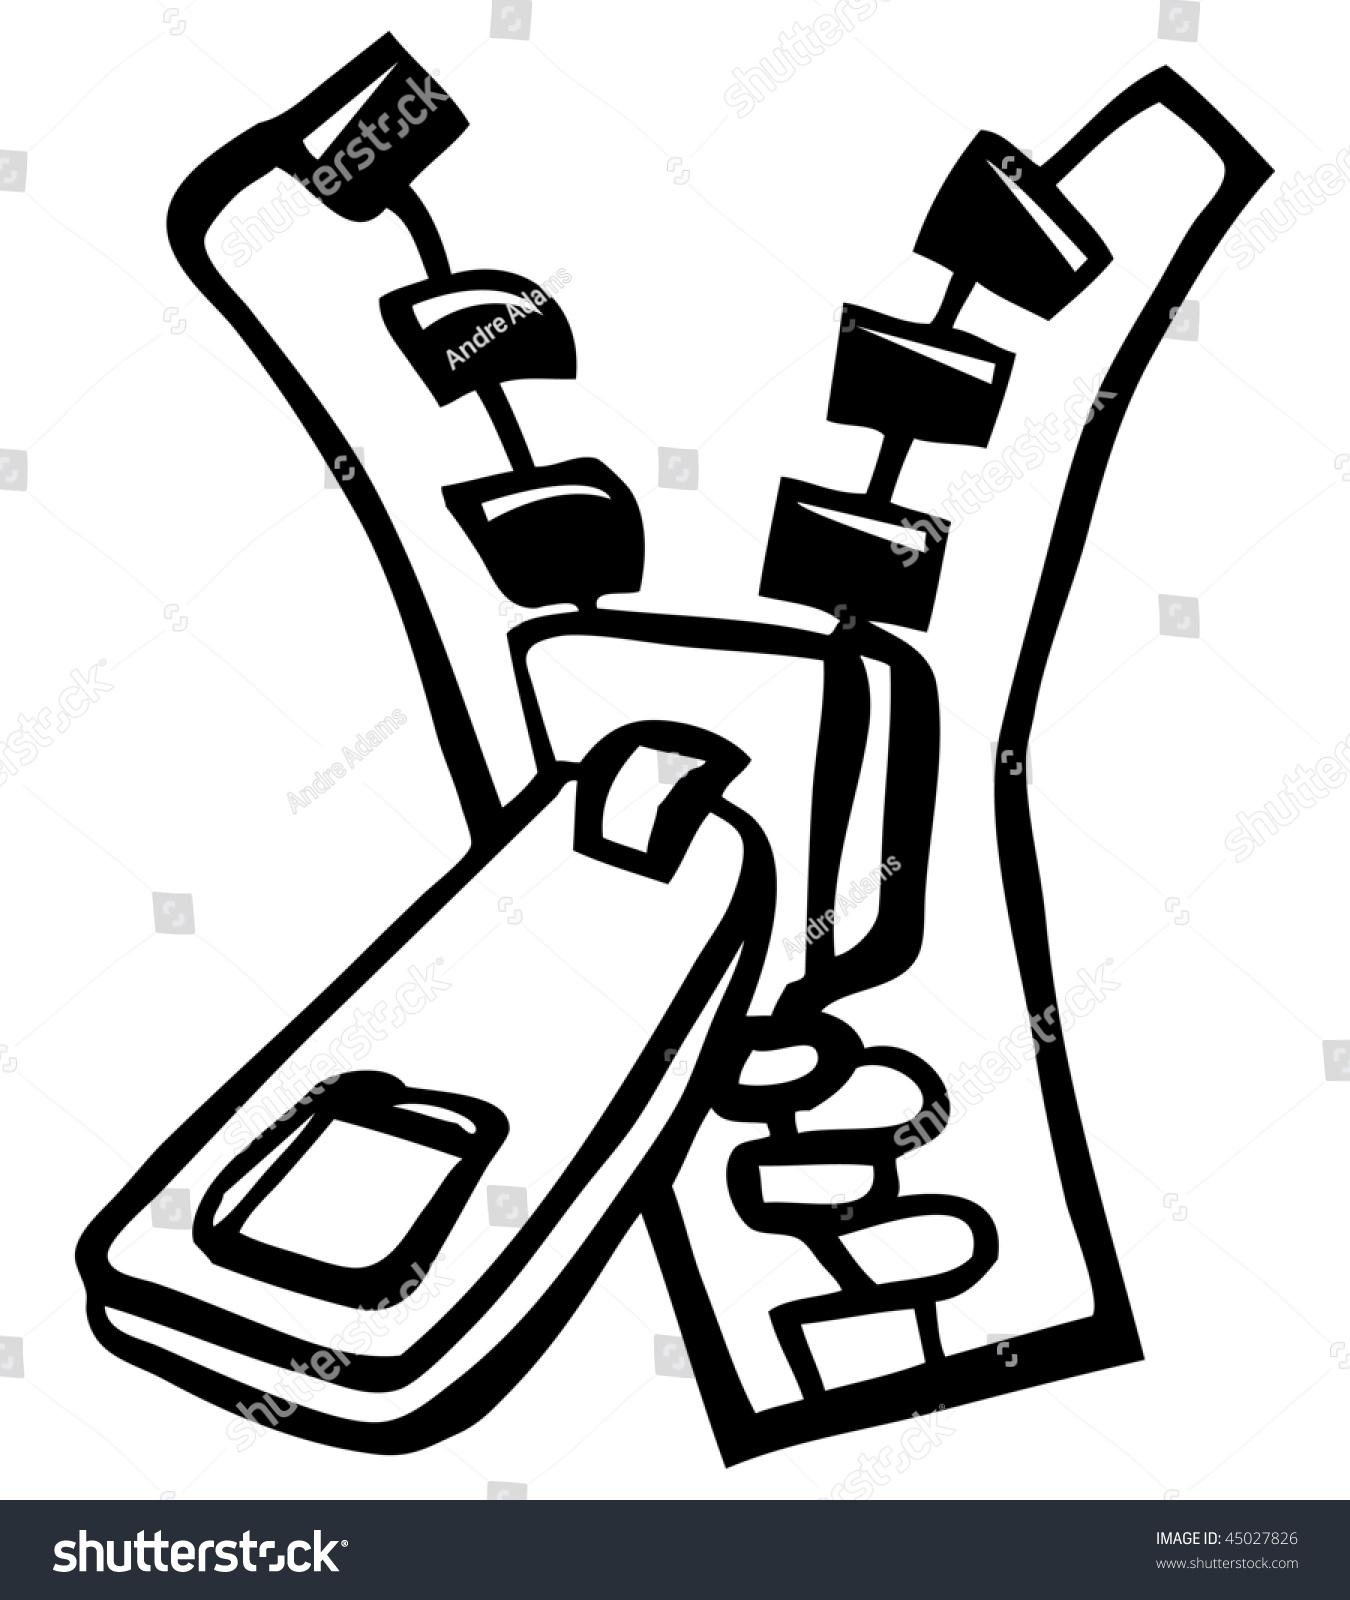 Zipper Line Art : Cartoon vector outline illustration zipper stock